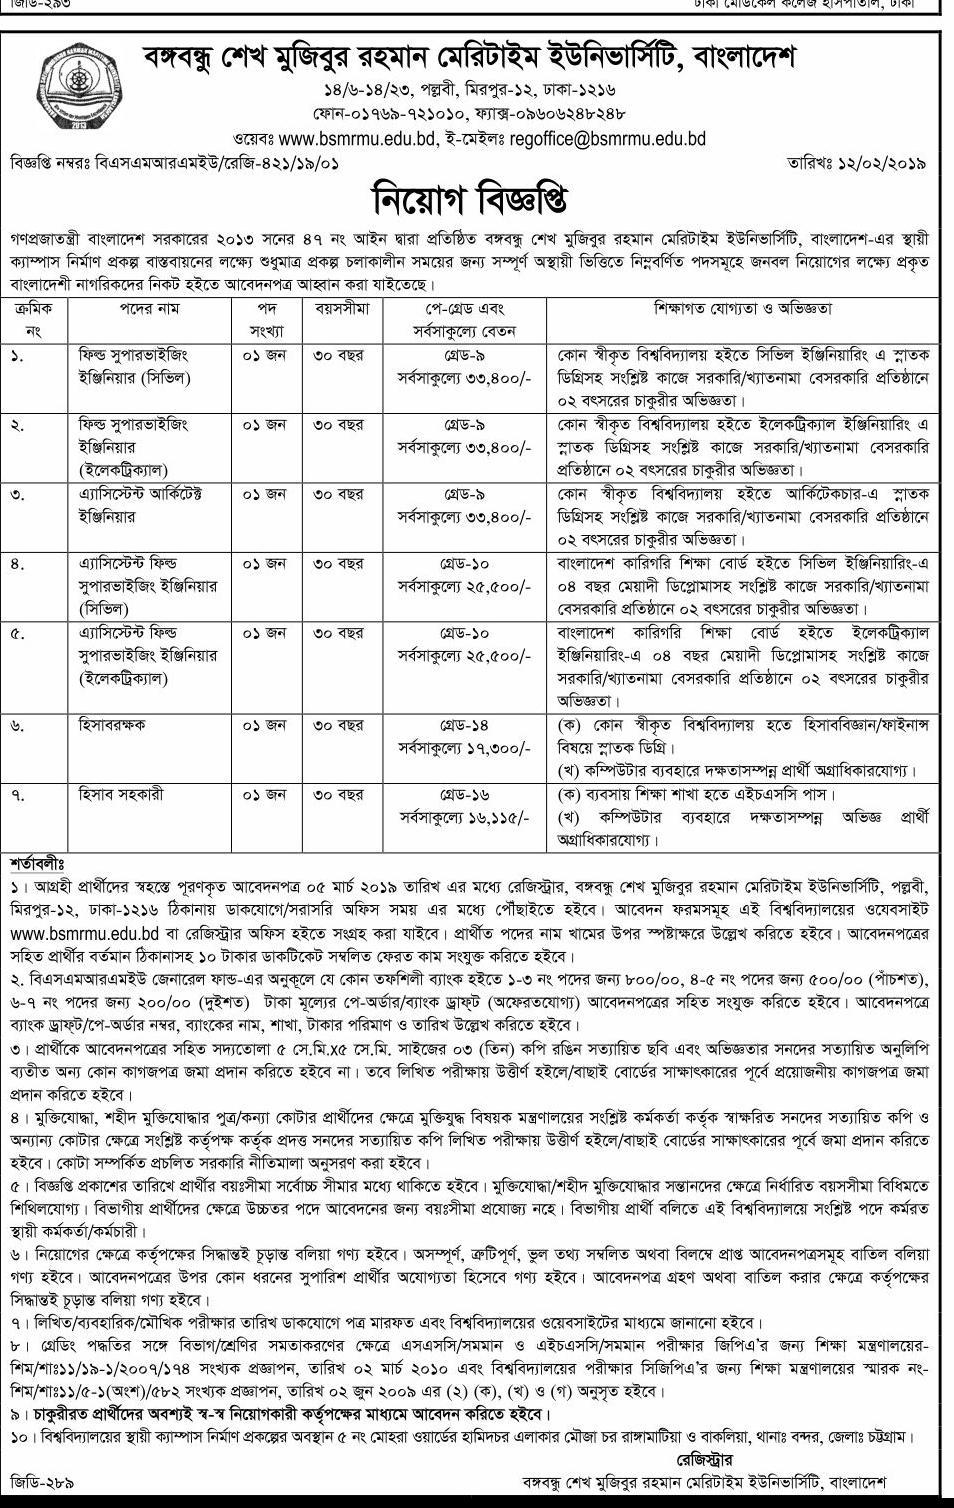 Bangabandhu Sheikh Mujibur Rahman Maritime University (BSMRMU) Job Circular 2019